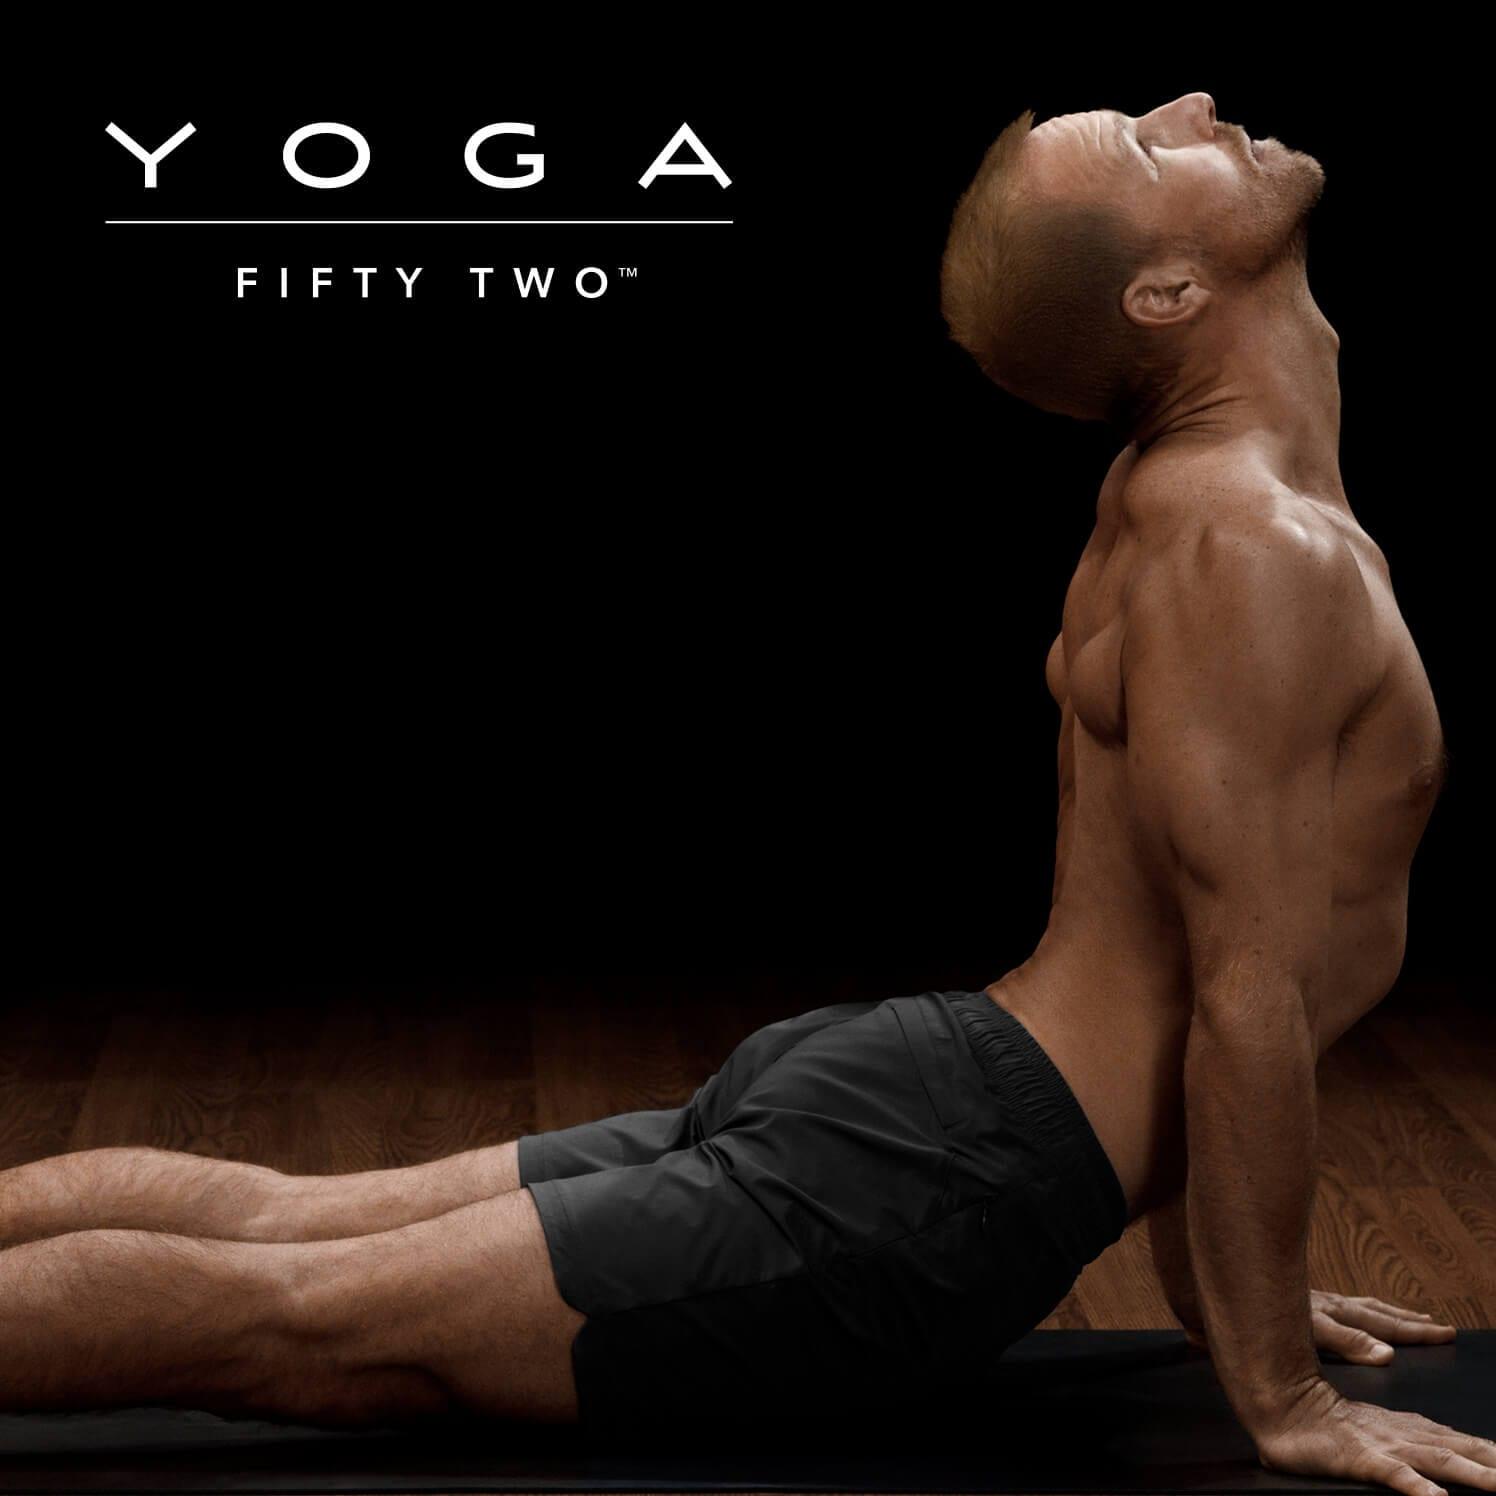 Yoga52™